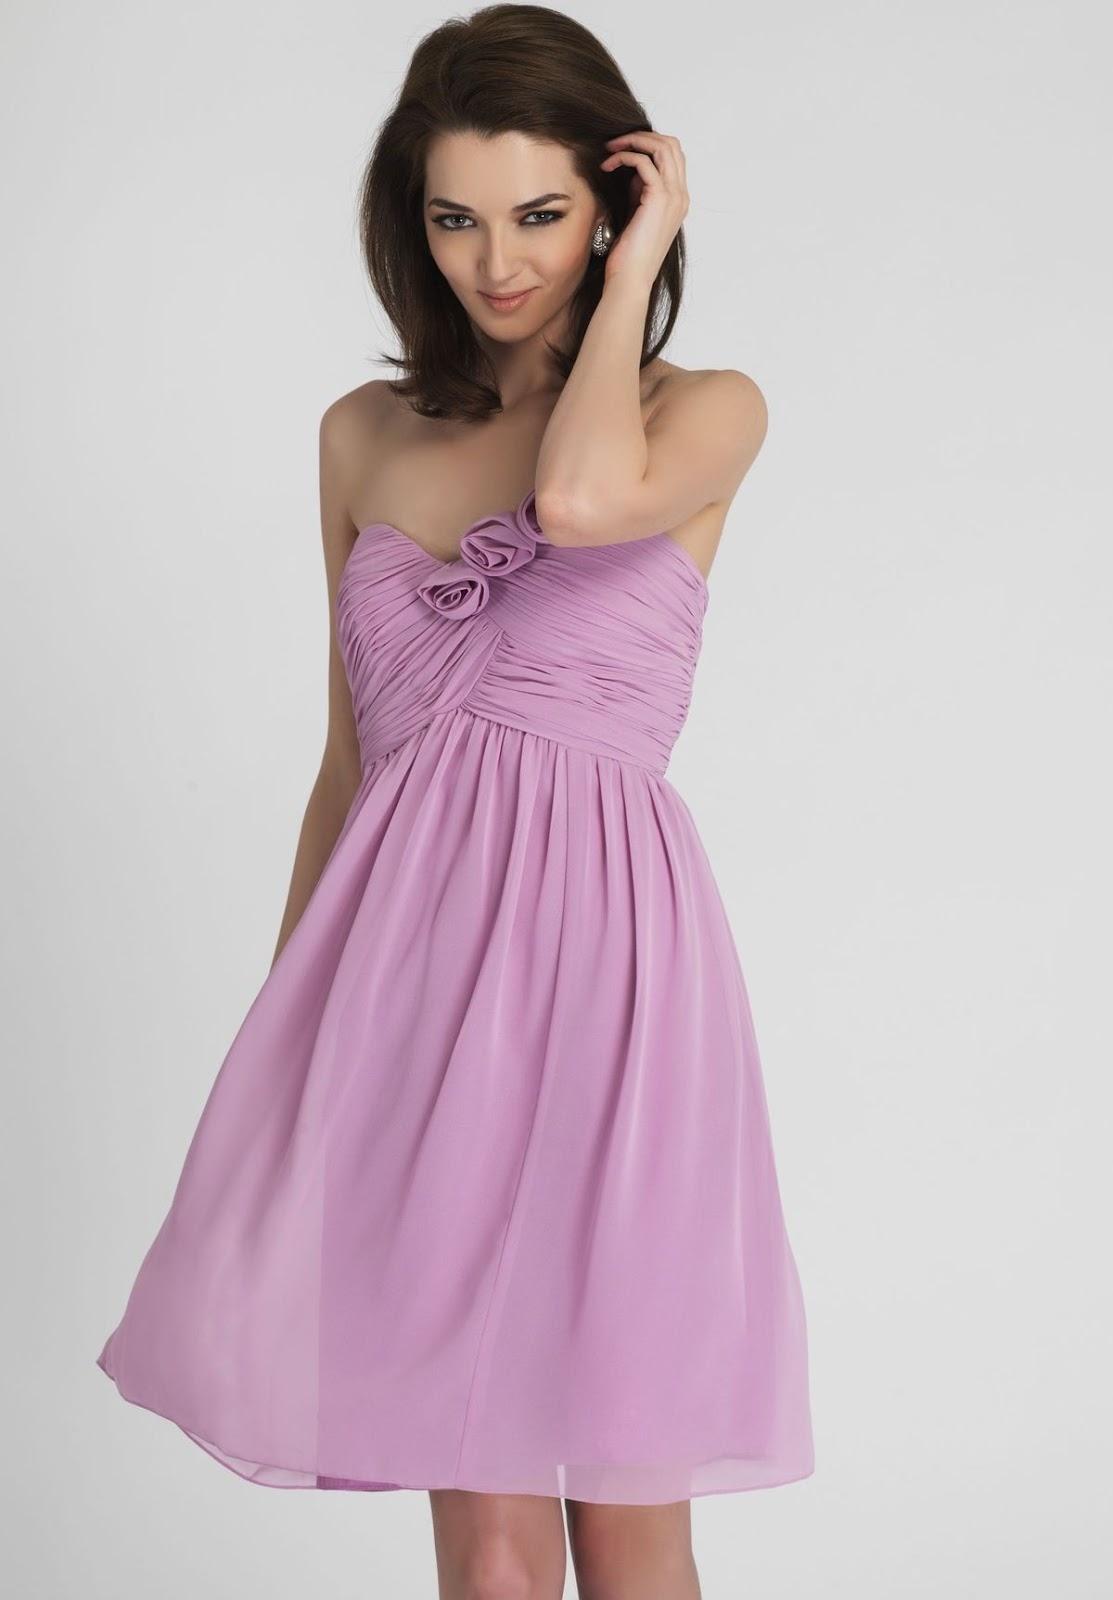 Purple bridesmaid dress march 2013 chiffon strapless sweetheart a line short bridesmaid dress ombrellifo Choice Image